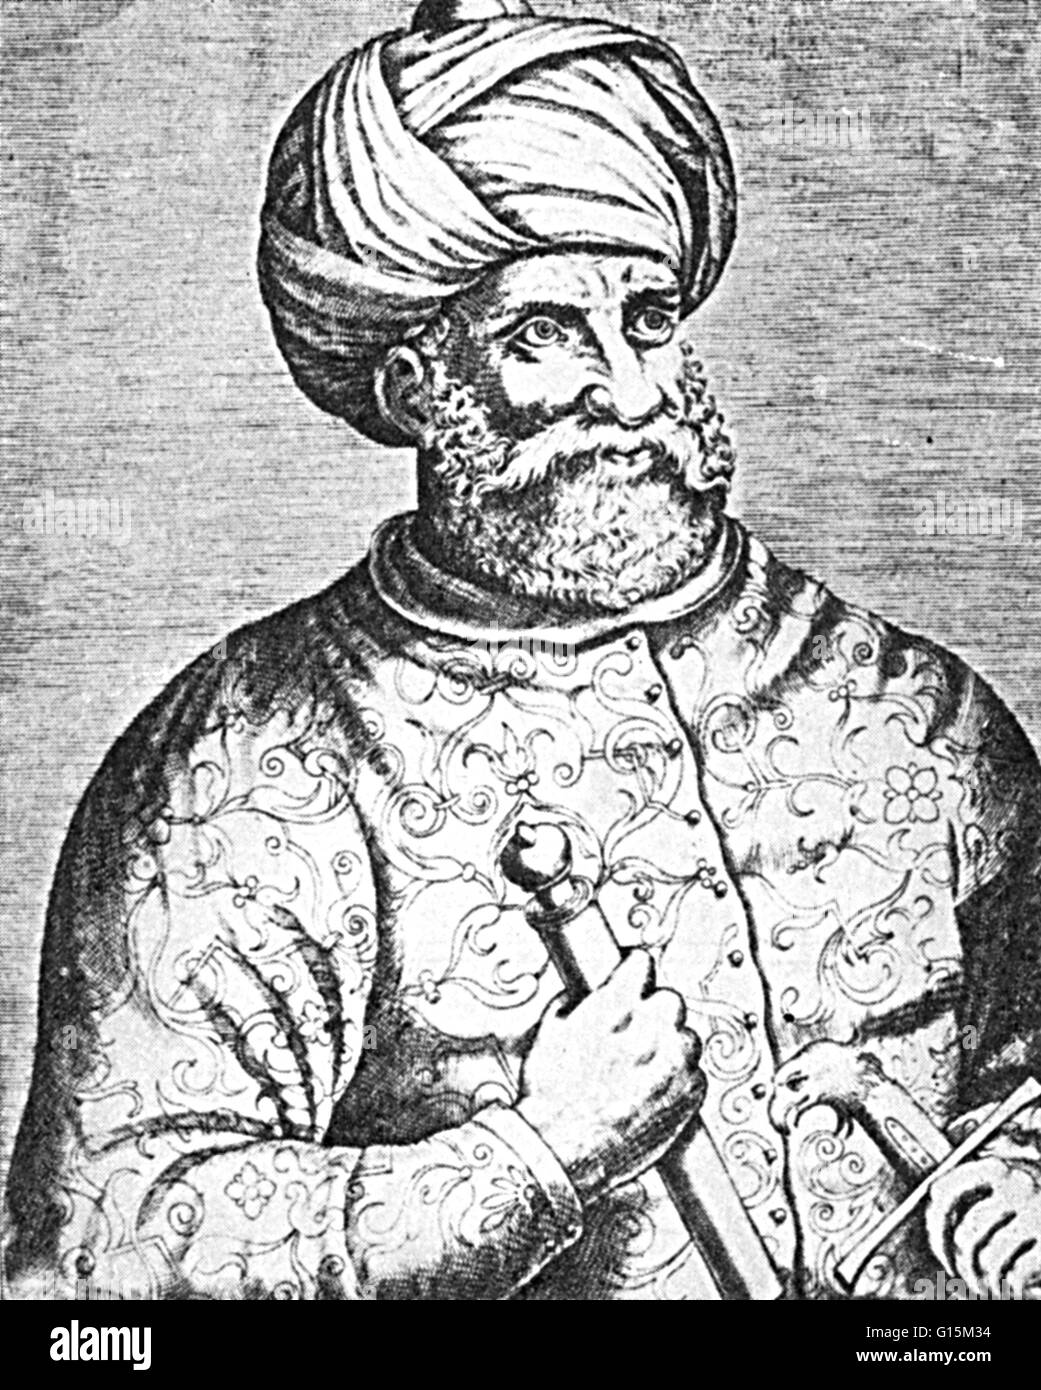 Hayreddin Barbarossa, or Barbarossa Hayreddin Pasha (1478-1546), was an Ottoman Turkish admiral of the fleet who - Stock Image